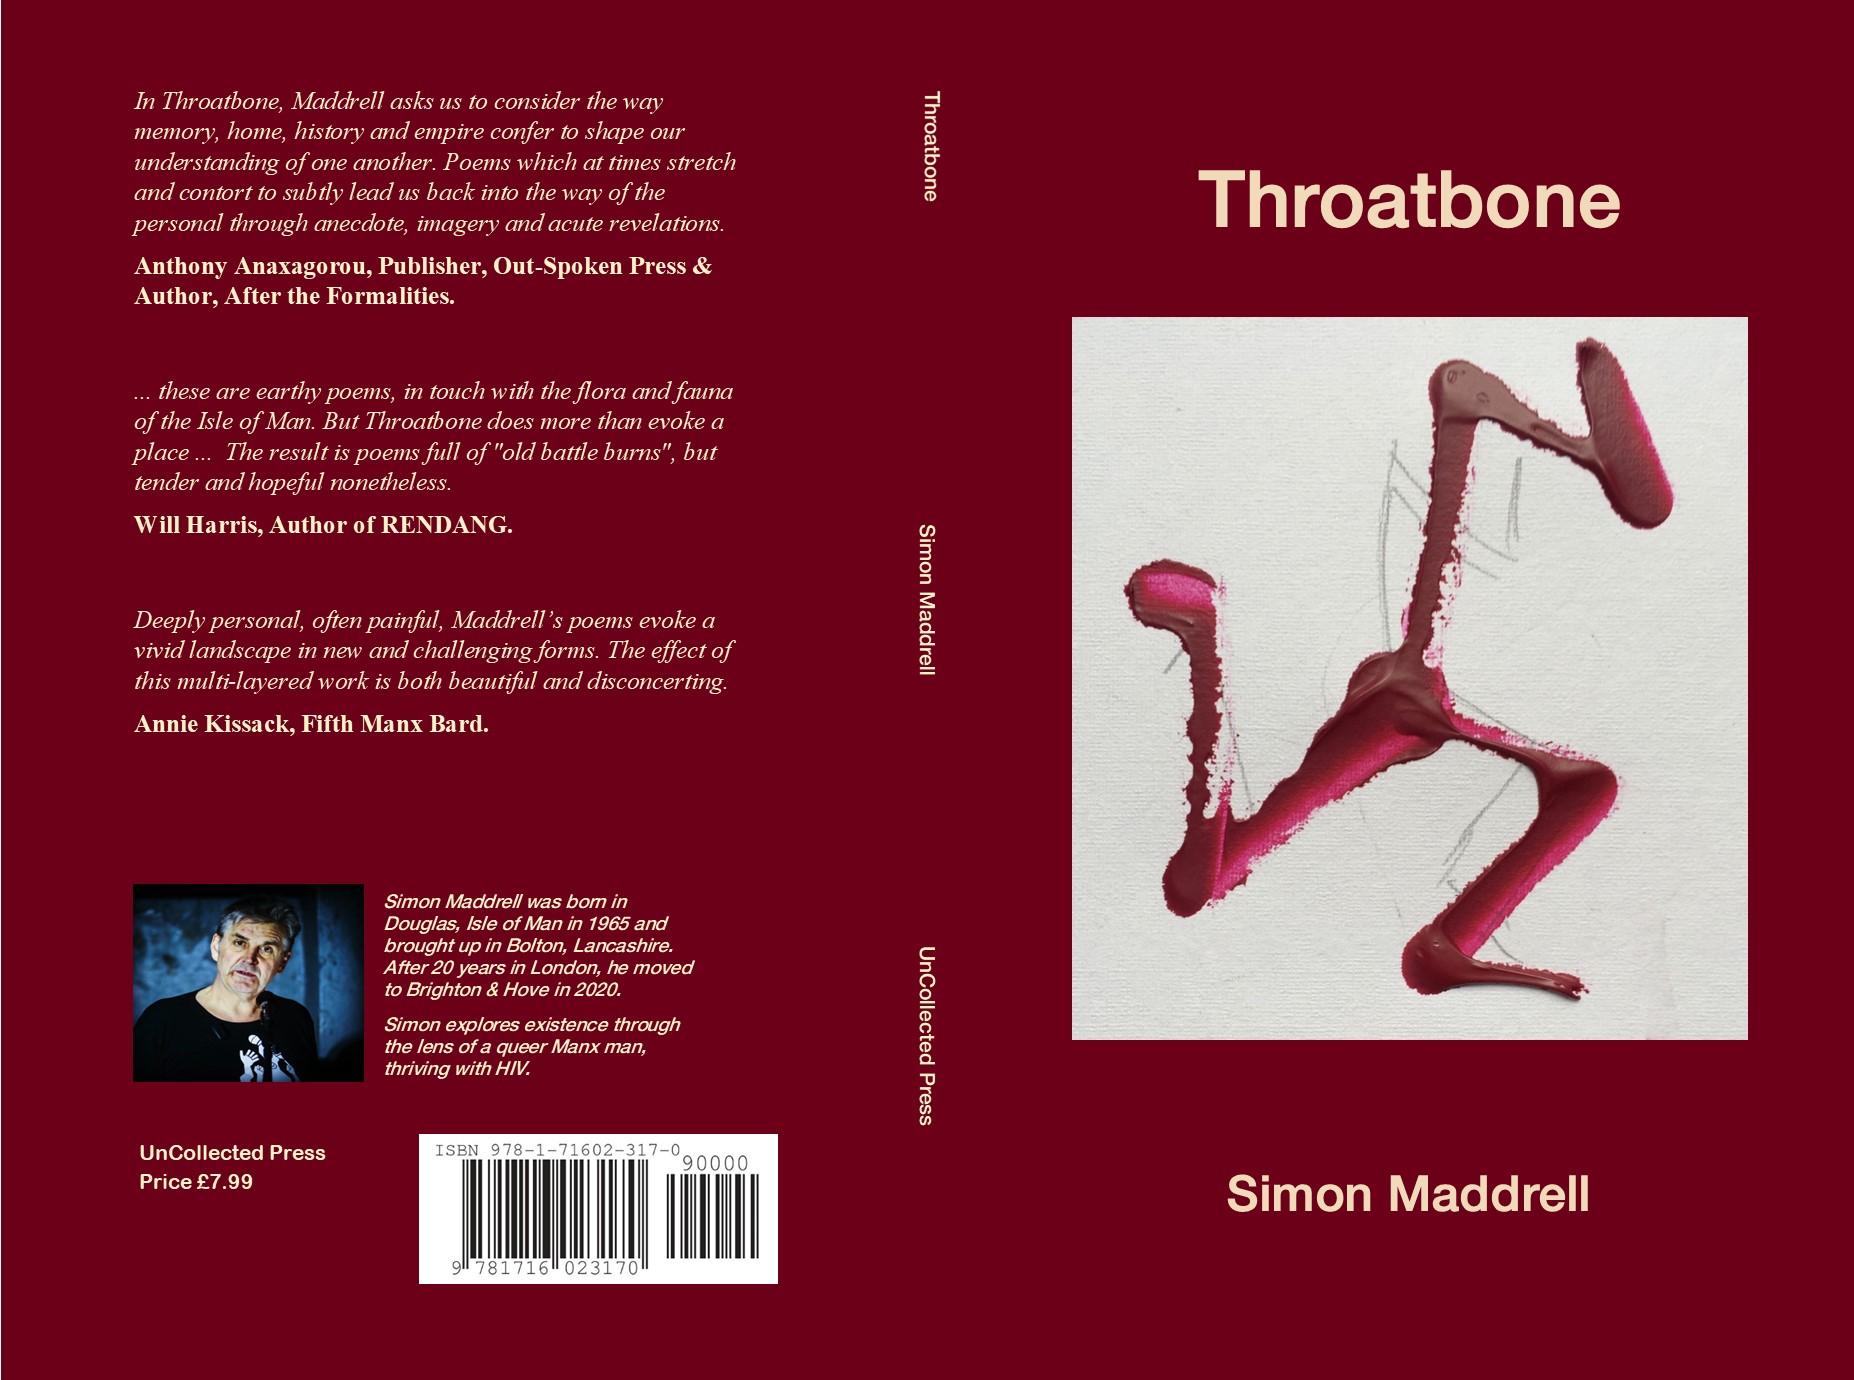 Simon Maddrell Throast Bone Cover Layout 20200715 002